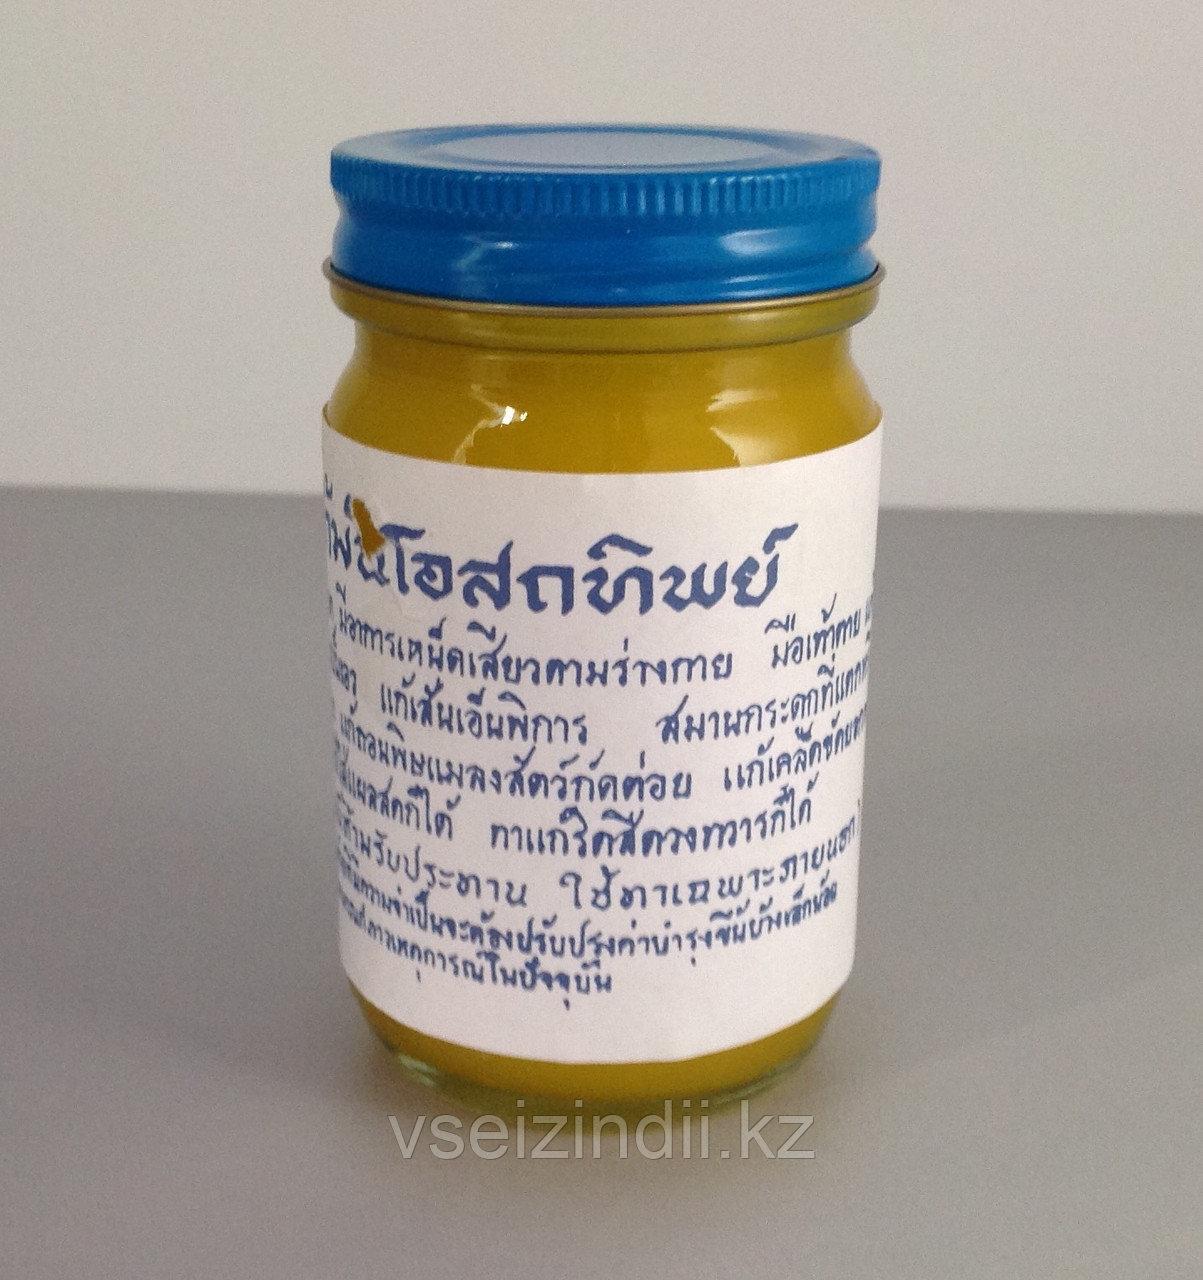 Традиционный Желтый Тайский Бальзам, 120 мл., Таиланд